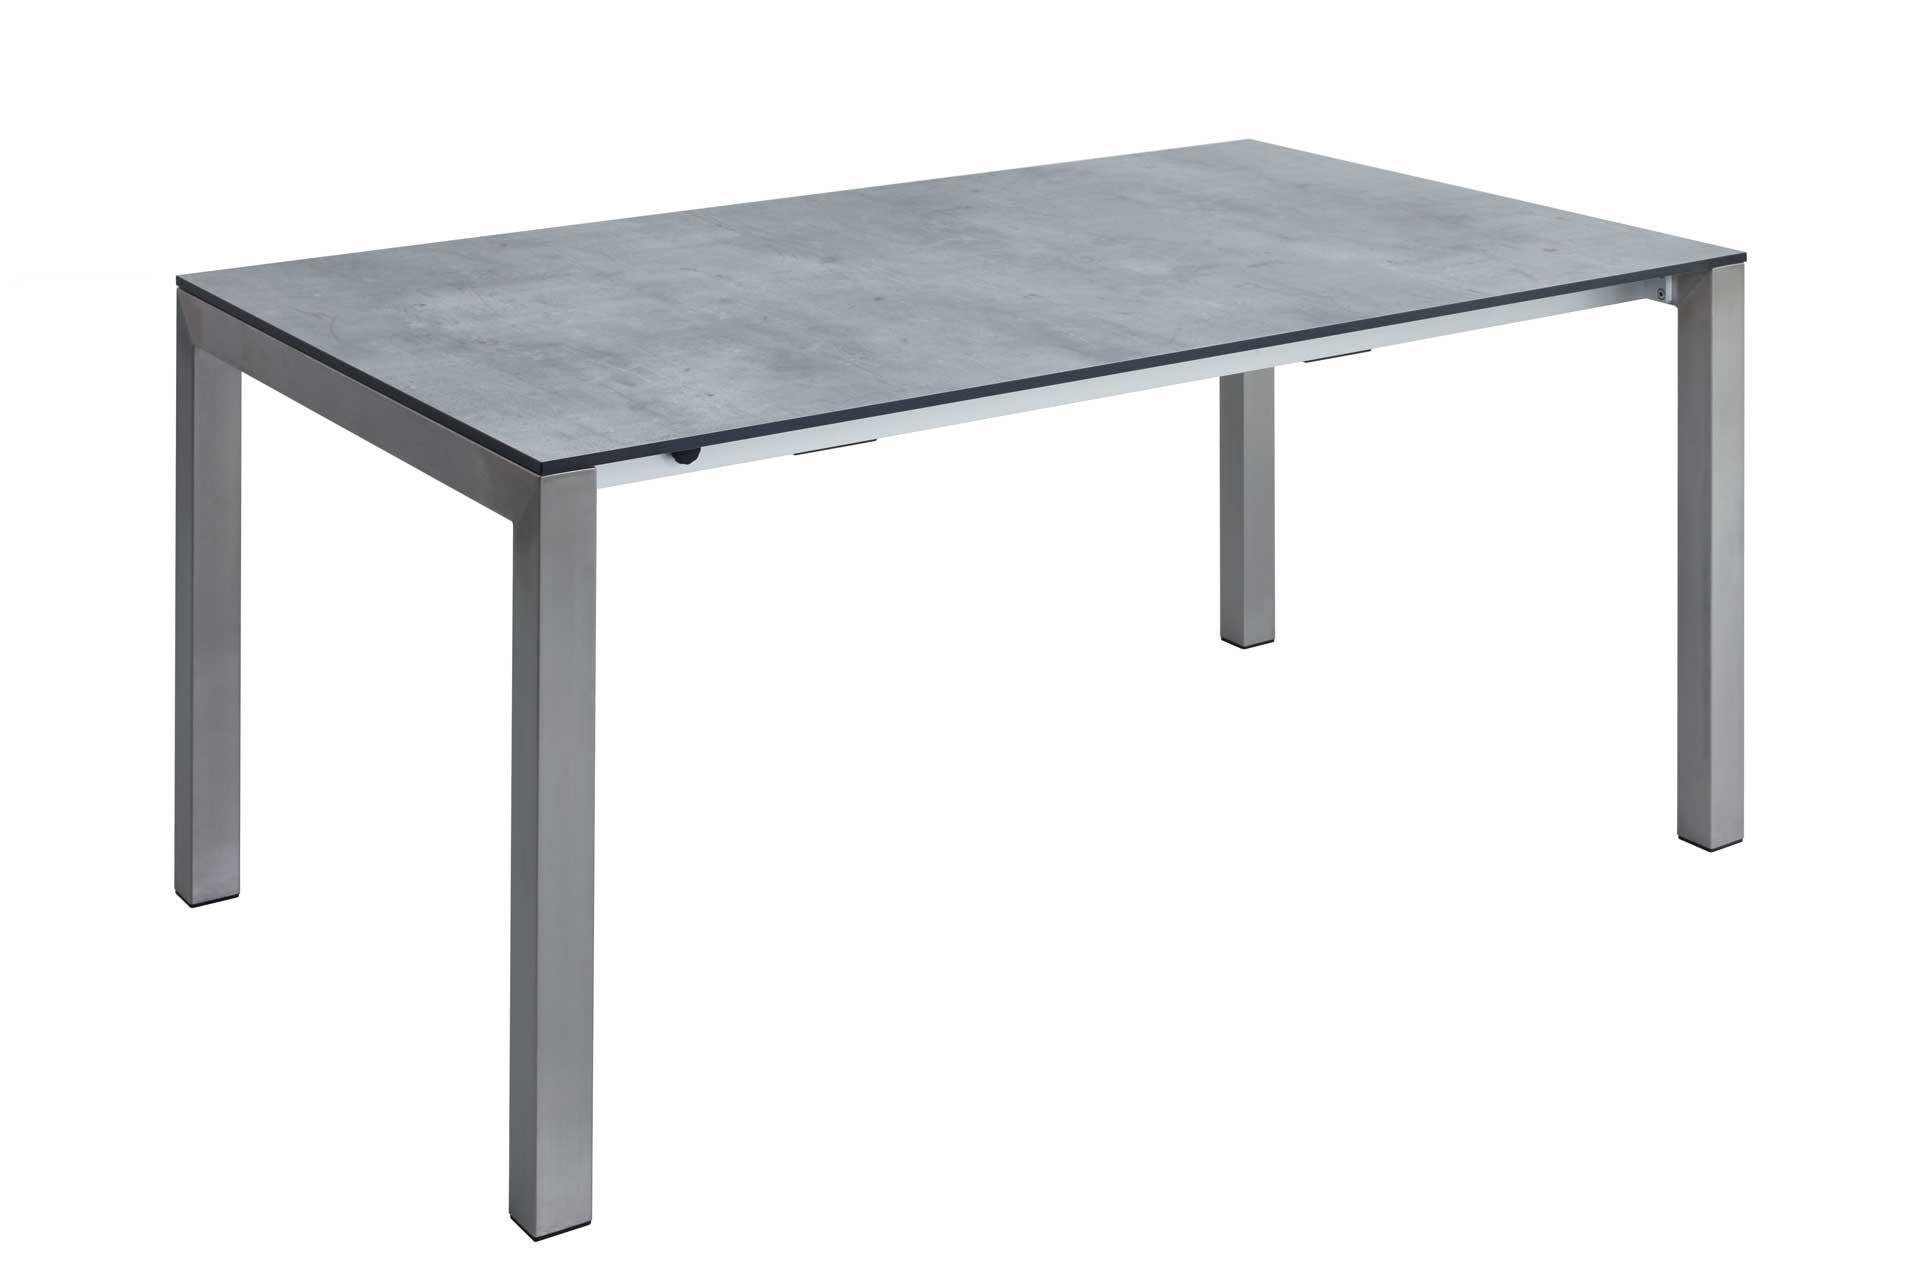 Gartentisch Kubus Tischplatte HPL Gestell Edelstahl